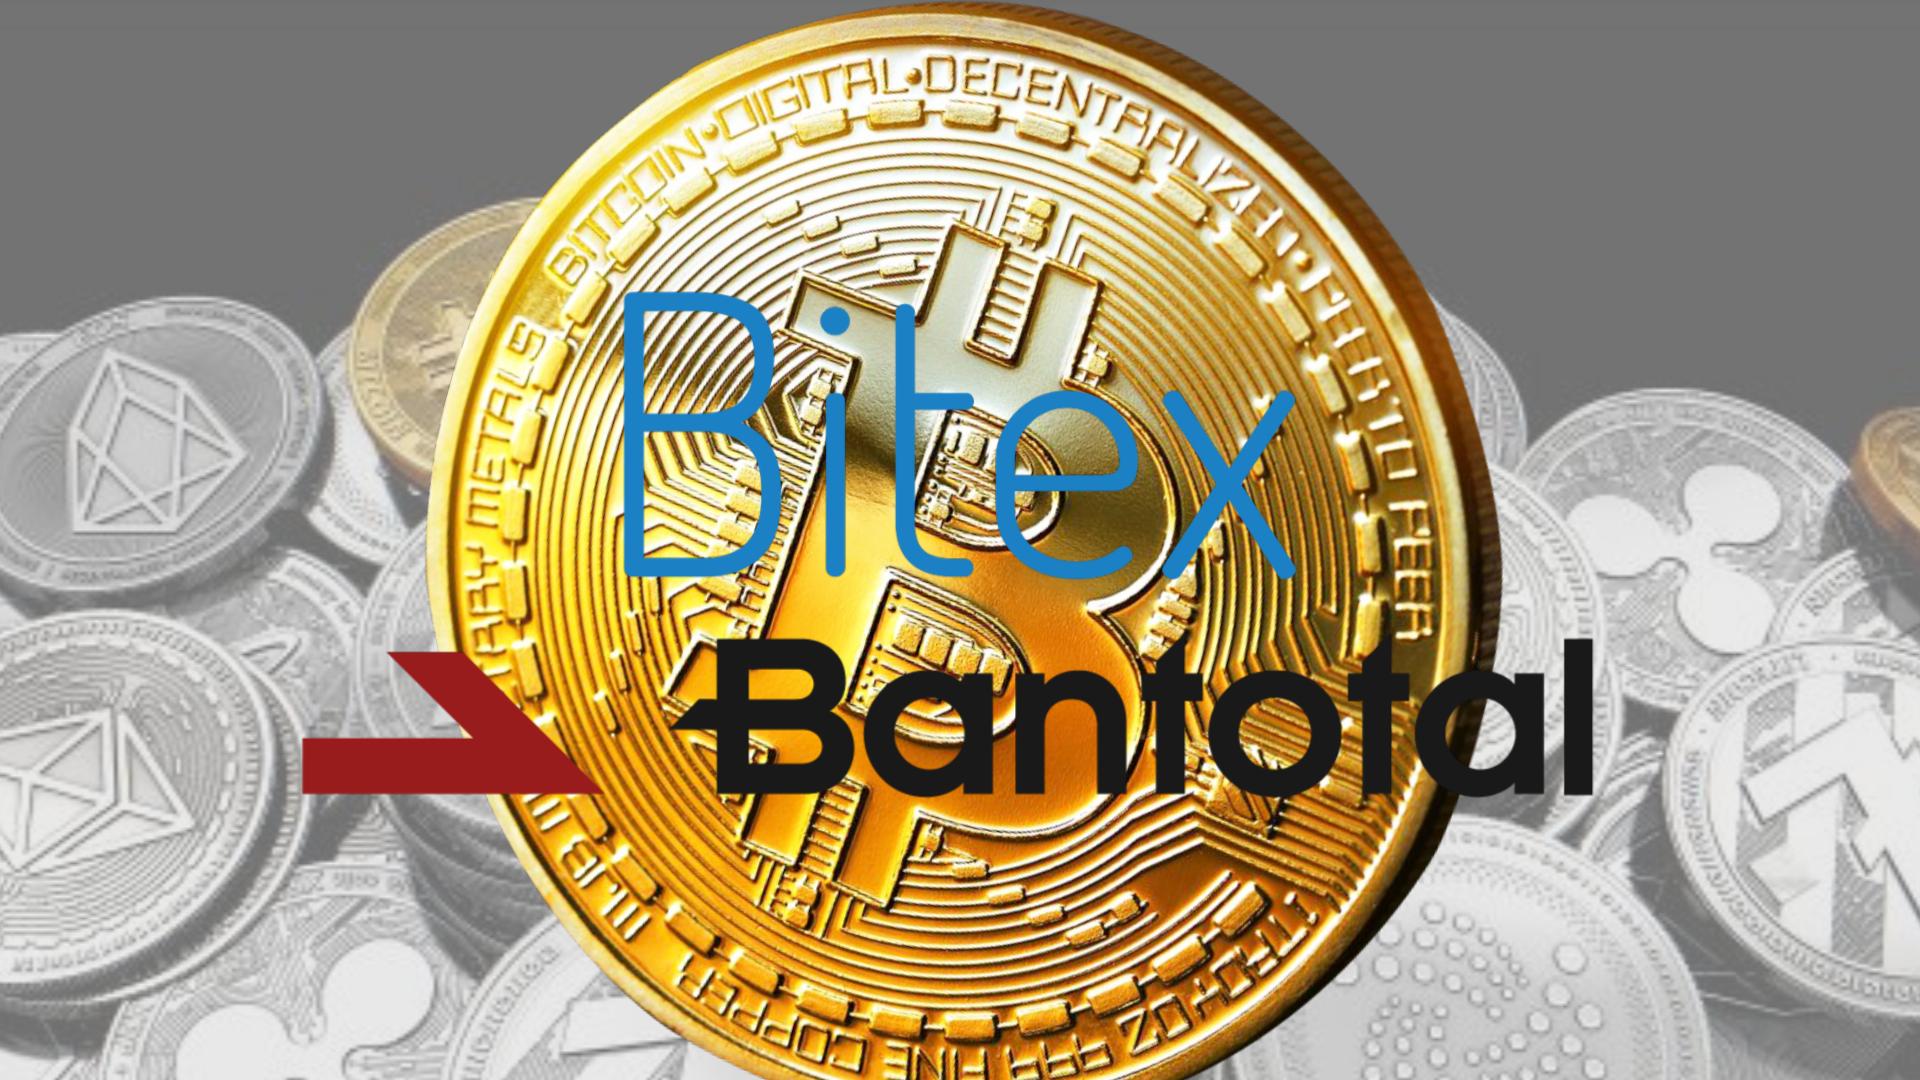 60 bancos latinoamericanos podrán usar bitcoin para pagos internacionales con tecnología blockchain